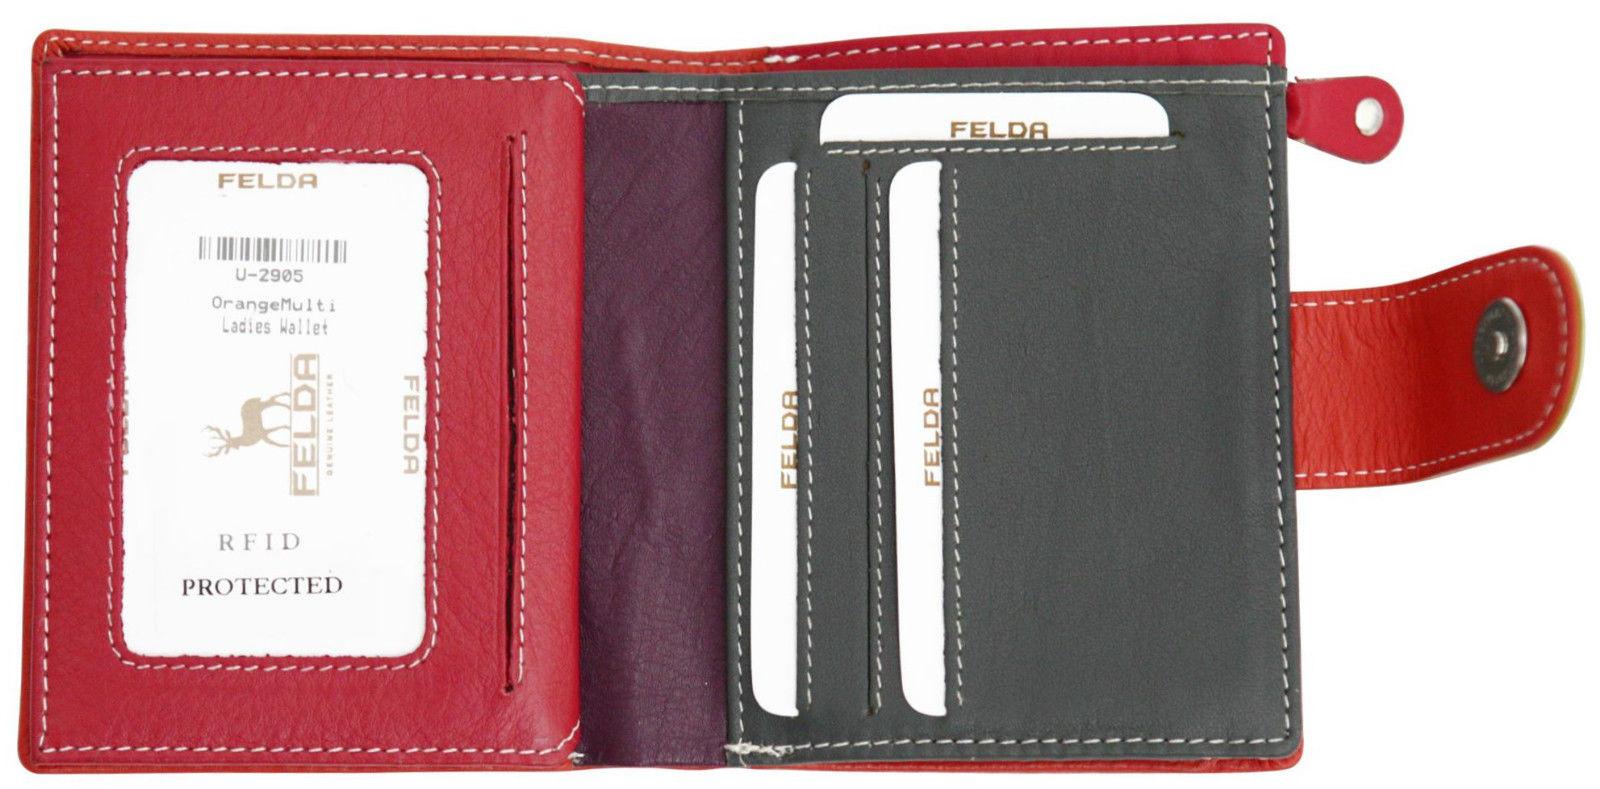 Felda-RFID-onorevoli-MEDAGLIA-amp-Card-Purse-Wallet-Genuine-Leather-Multi-SOFT-BOX-REGALO miniatura 69